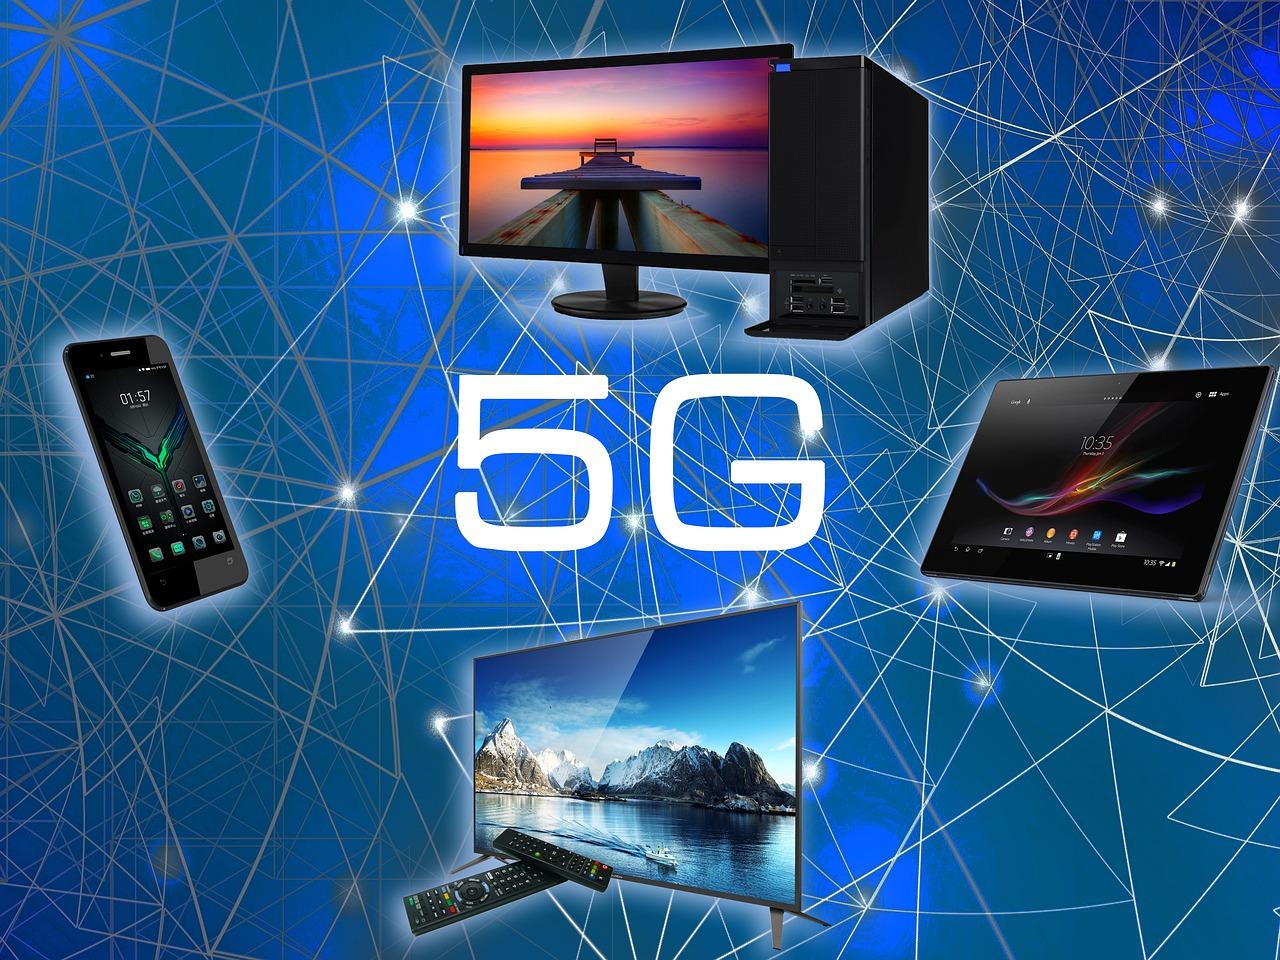 Network 5G The Internet - Free image on Pixabay